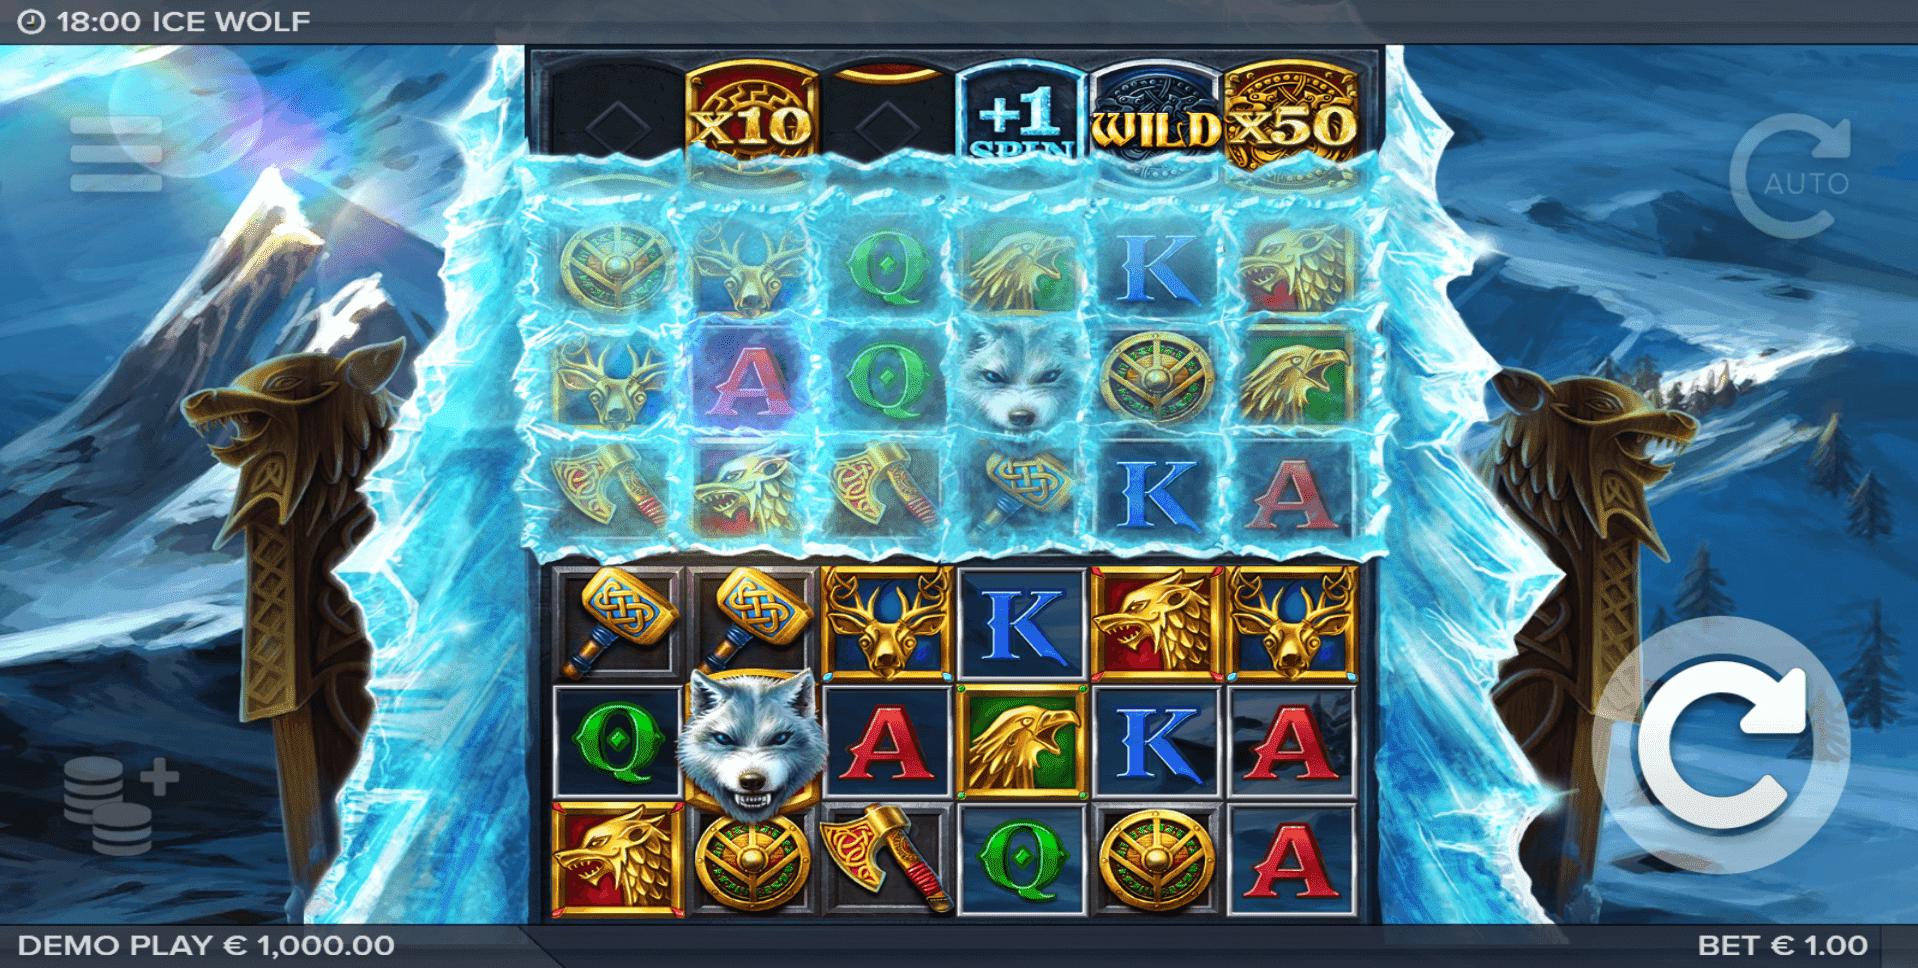 Ice Wolf slot play free